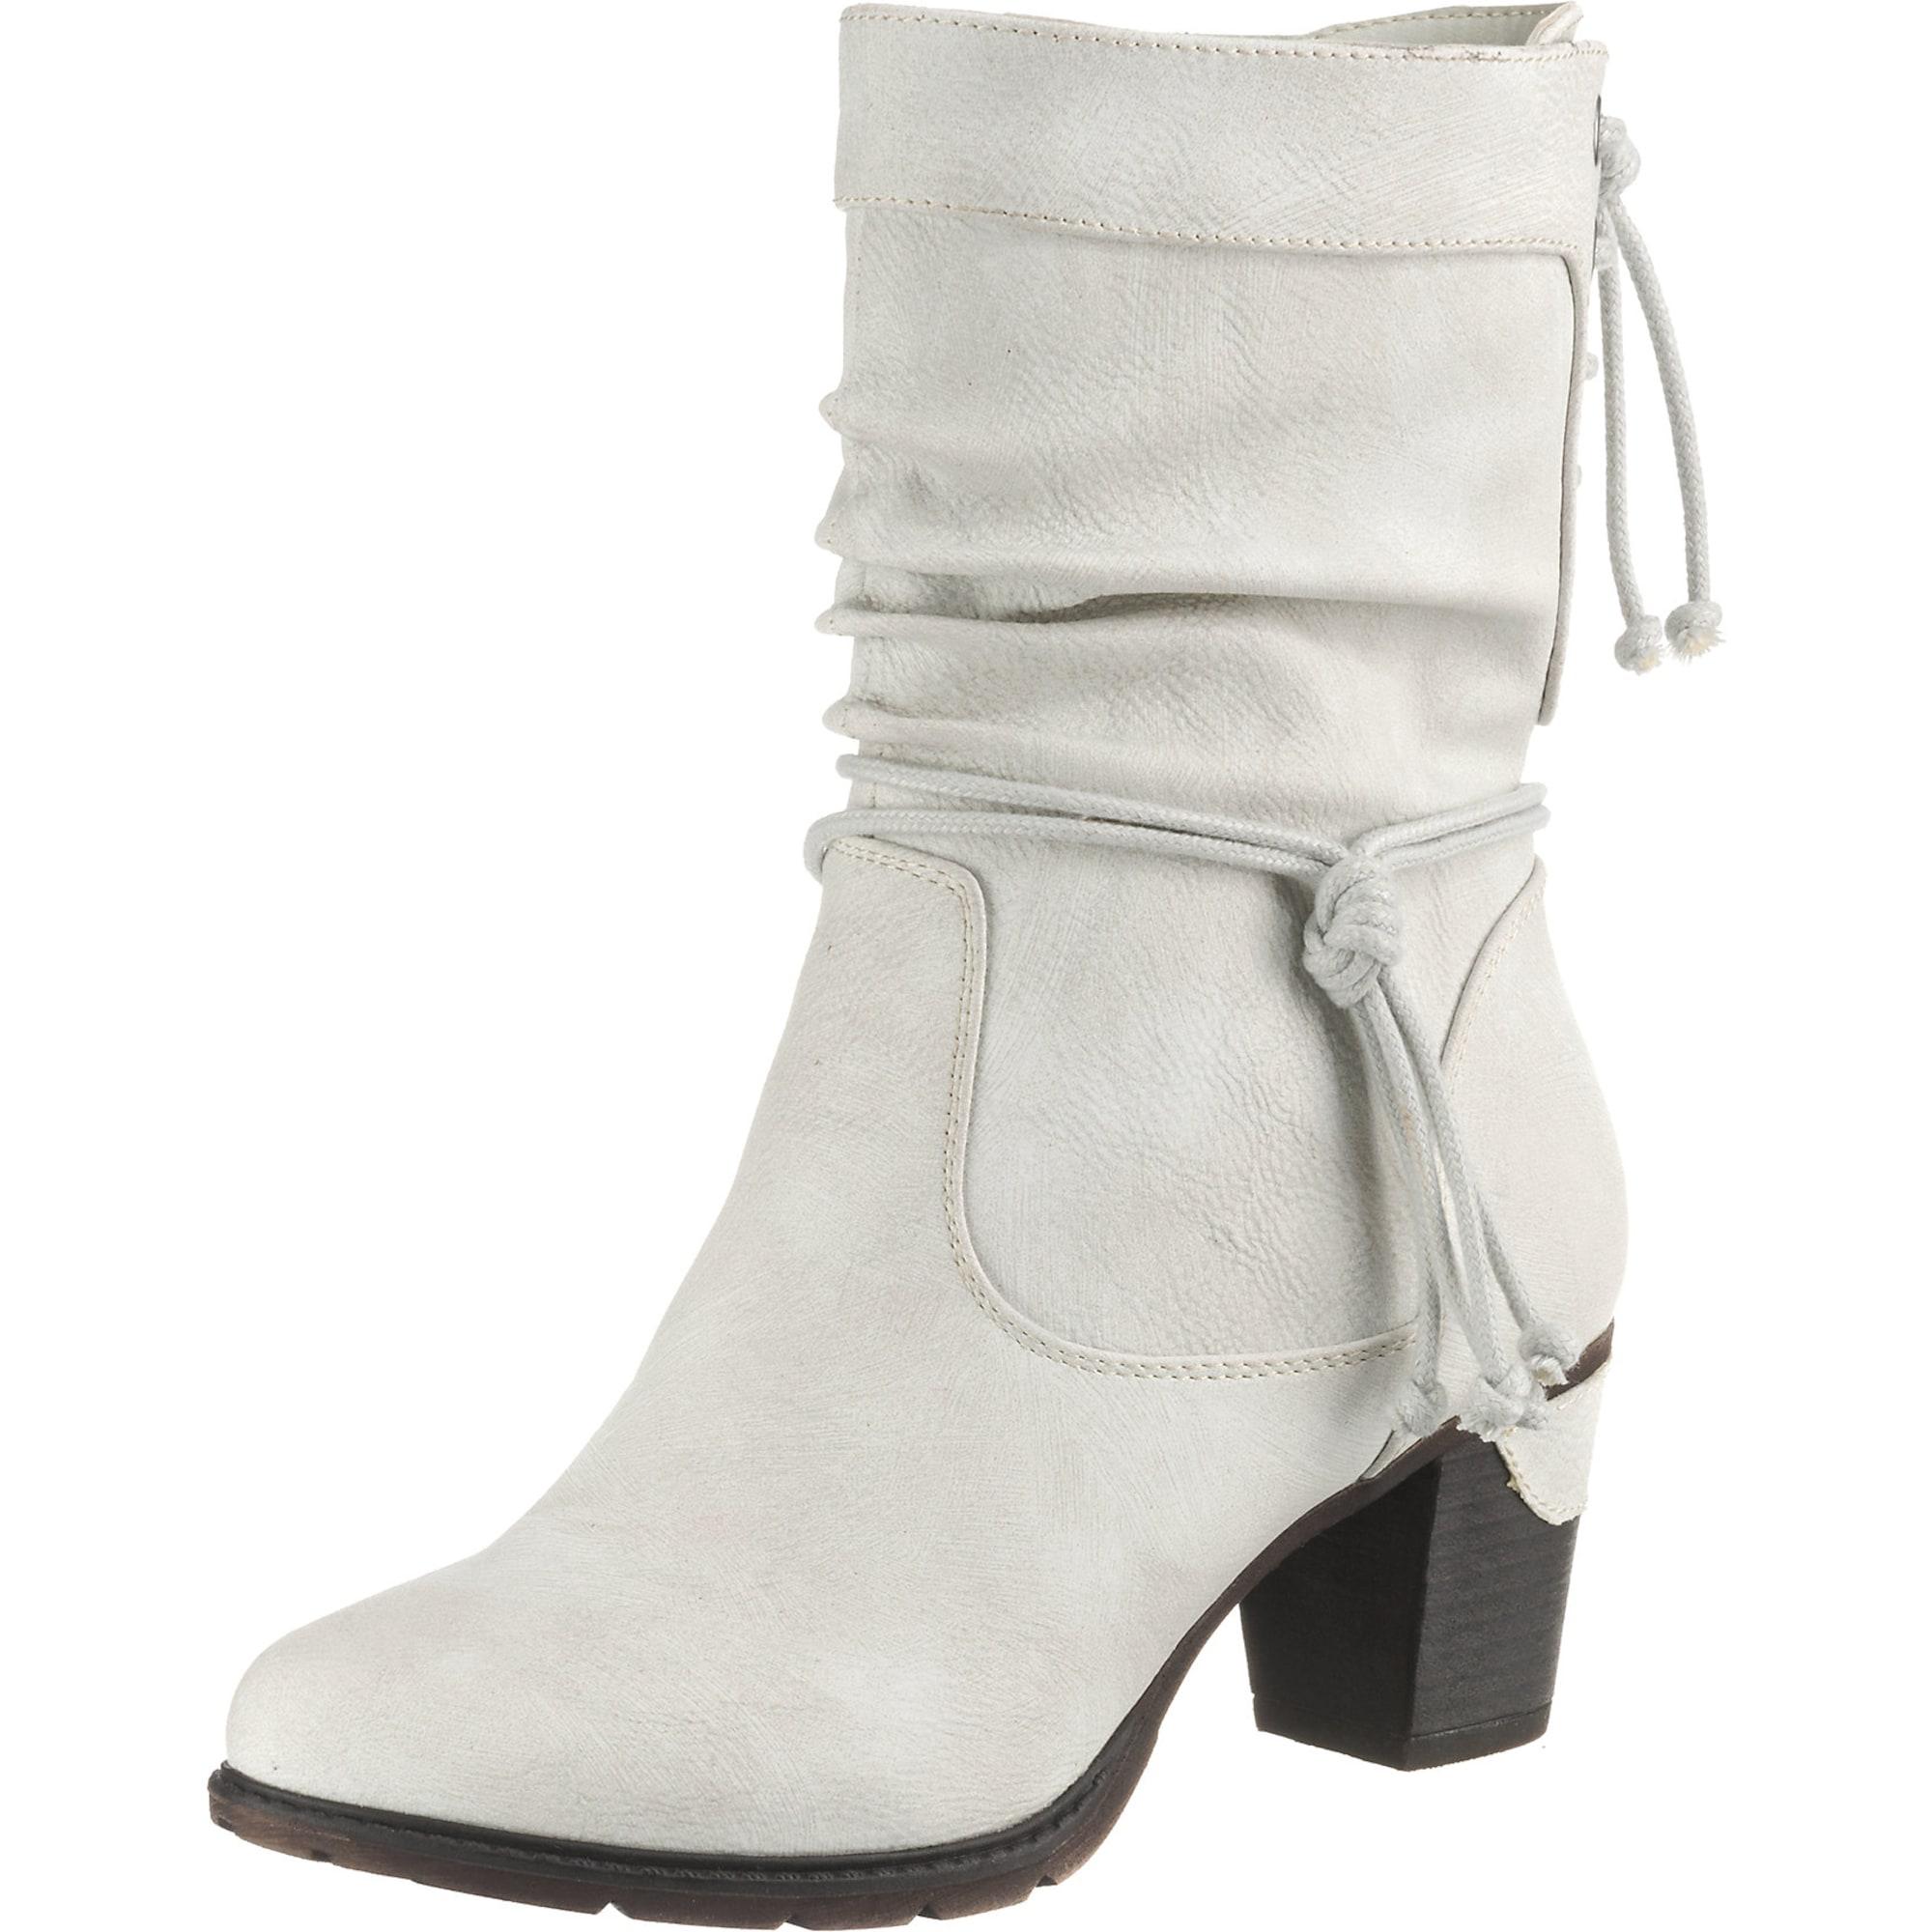 Winterstiefeletten   Schuhe > Stiefeletten > Winterstiefeletten   Schwarz - Weiß   RIEKER